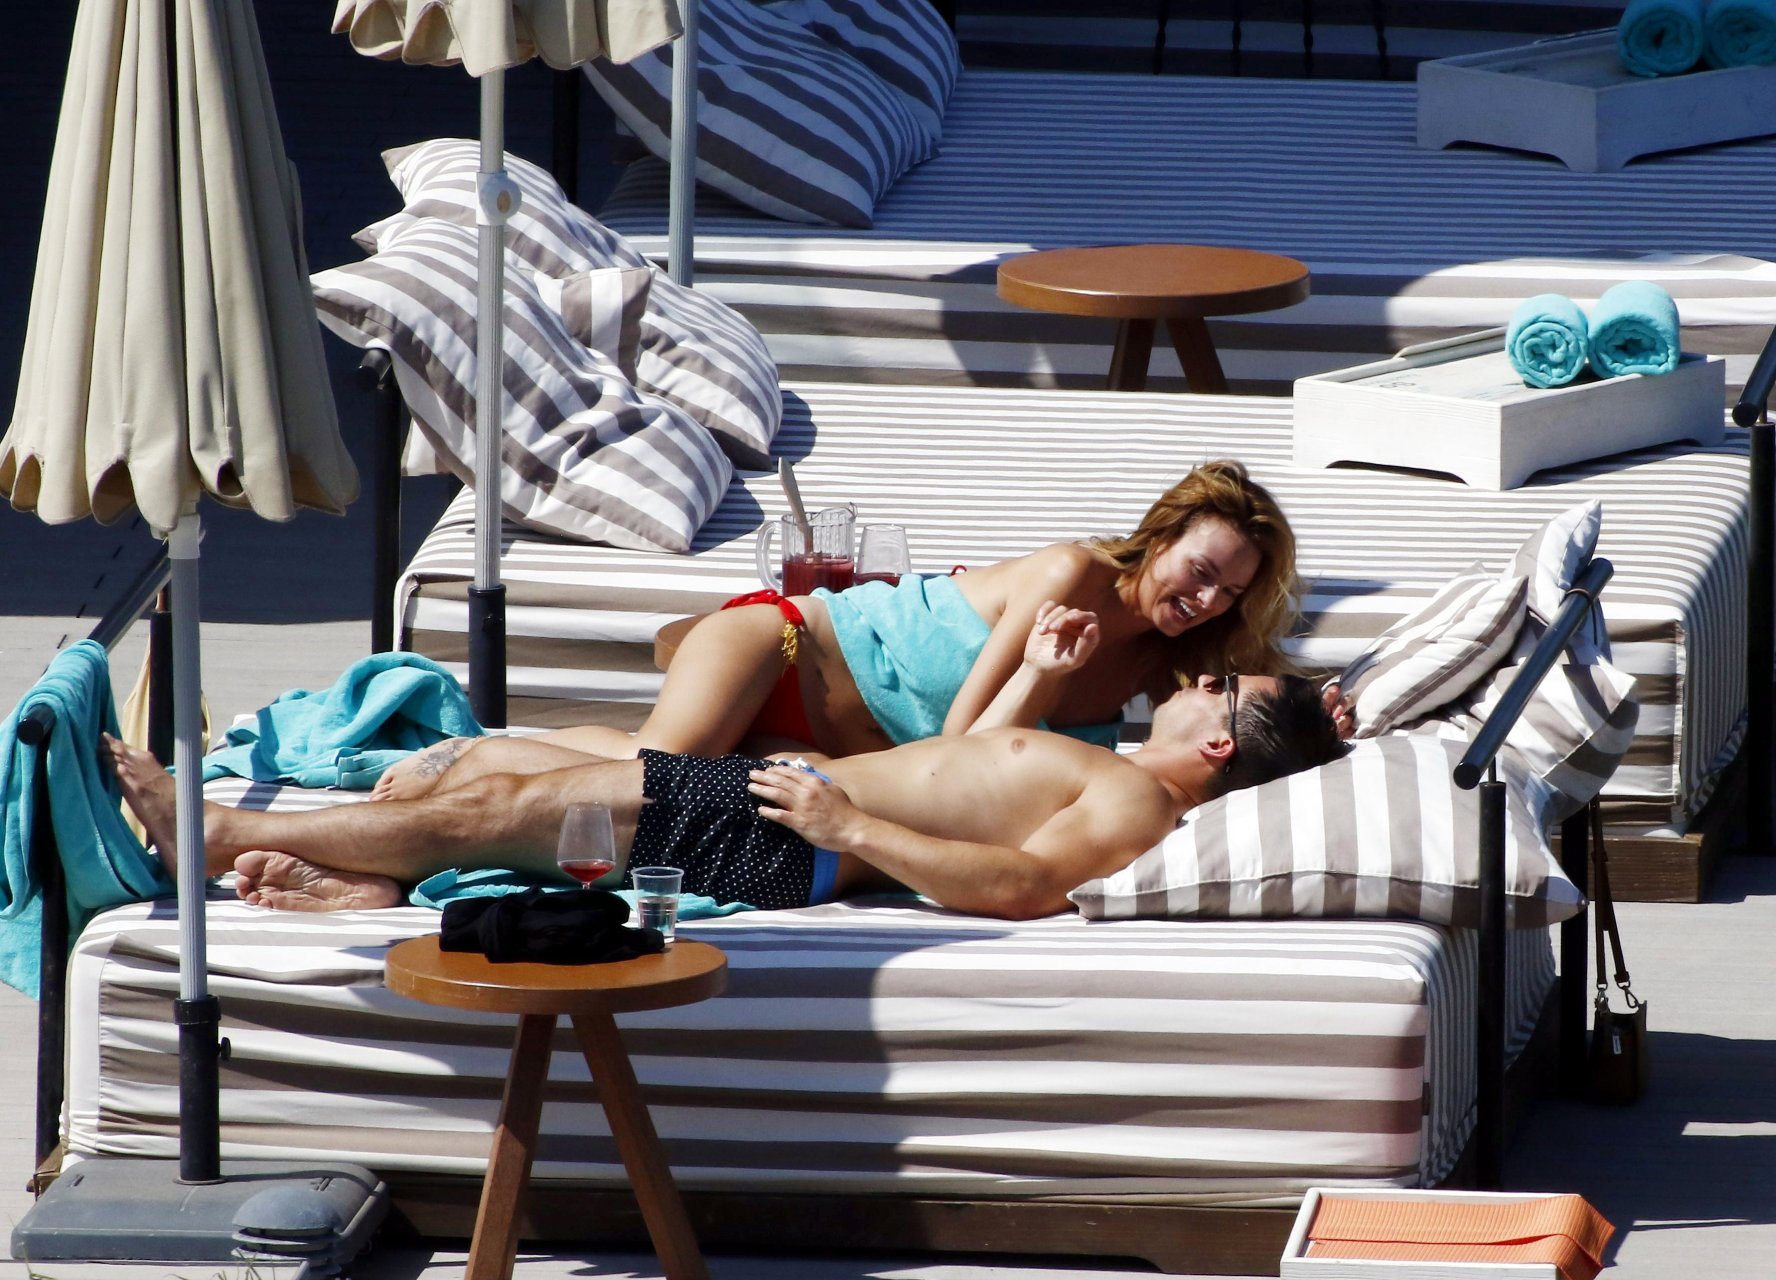 Rhian-Sugden-Sexy-Topless-TheFappeningBlog.com-49.jpg